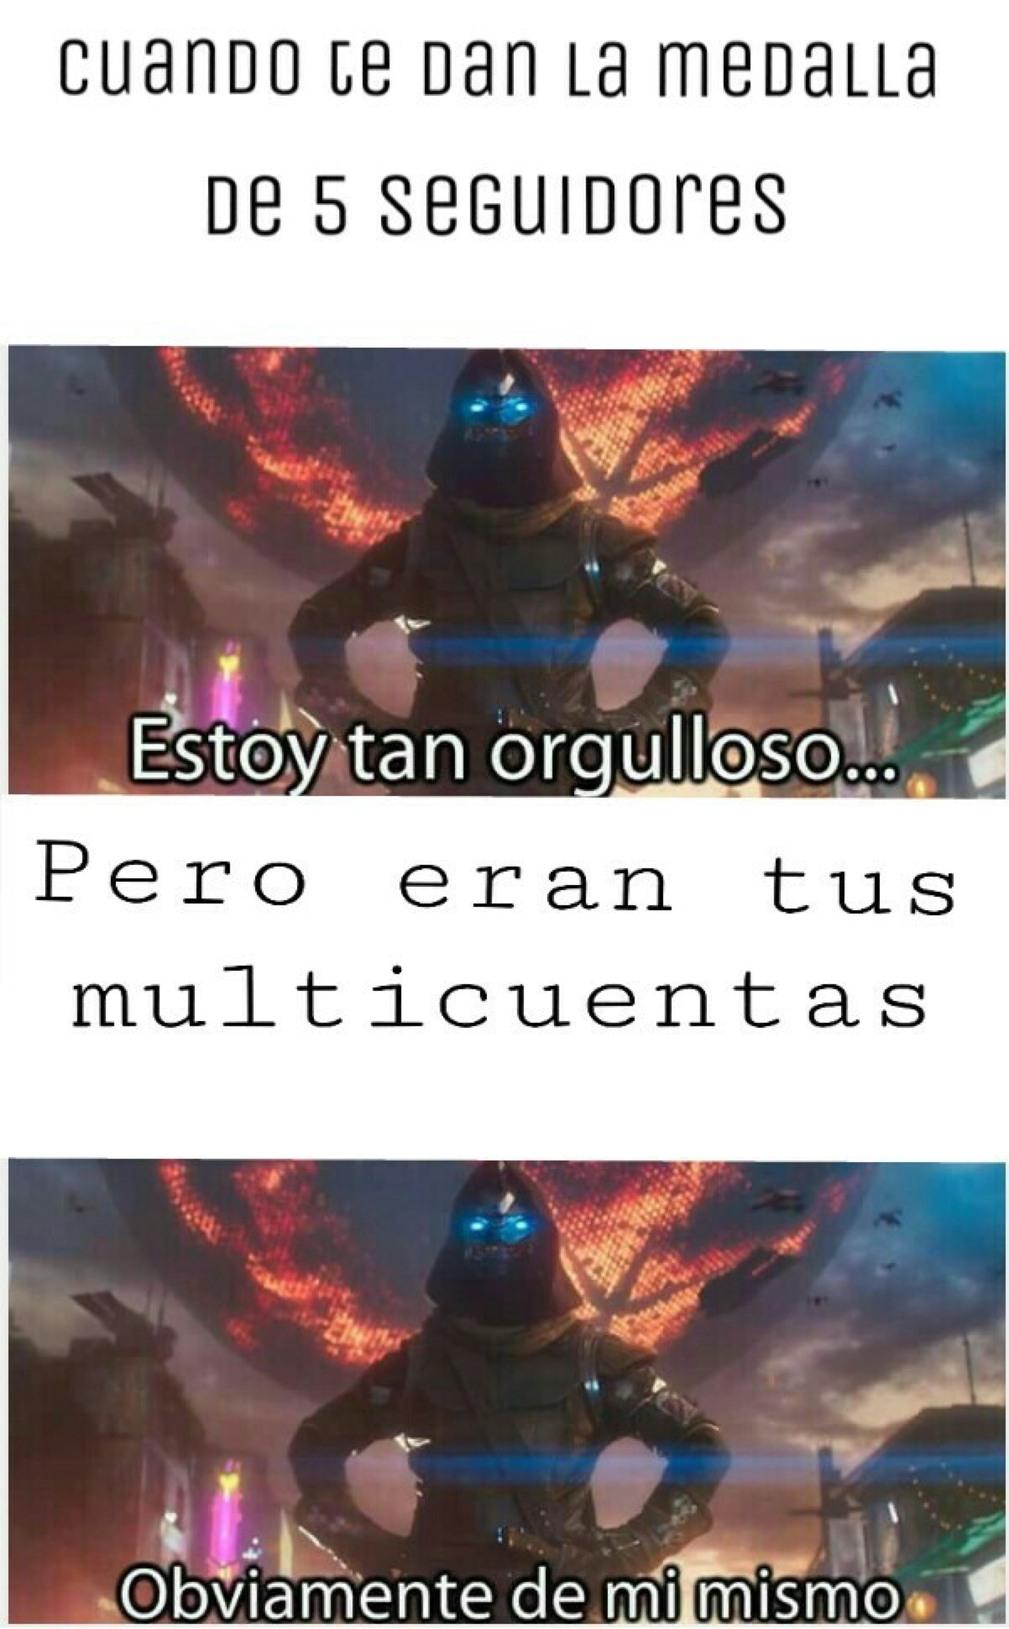 pff - meme